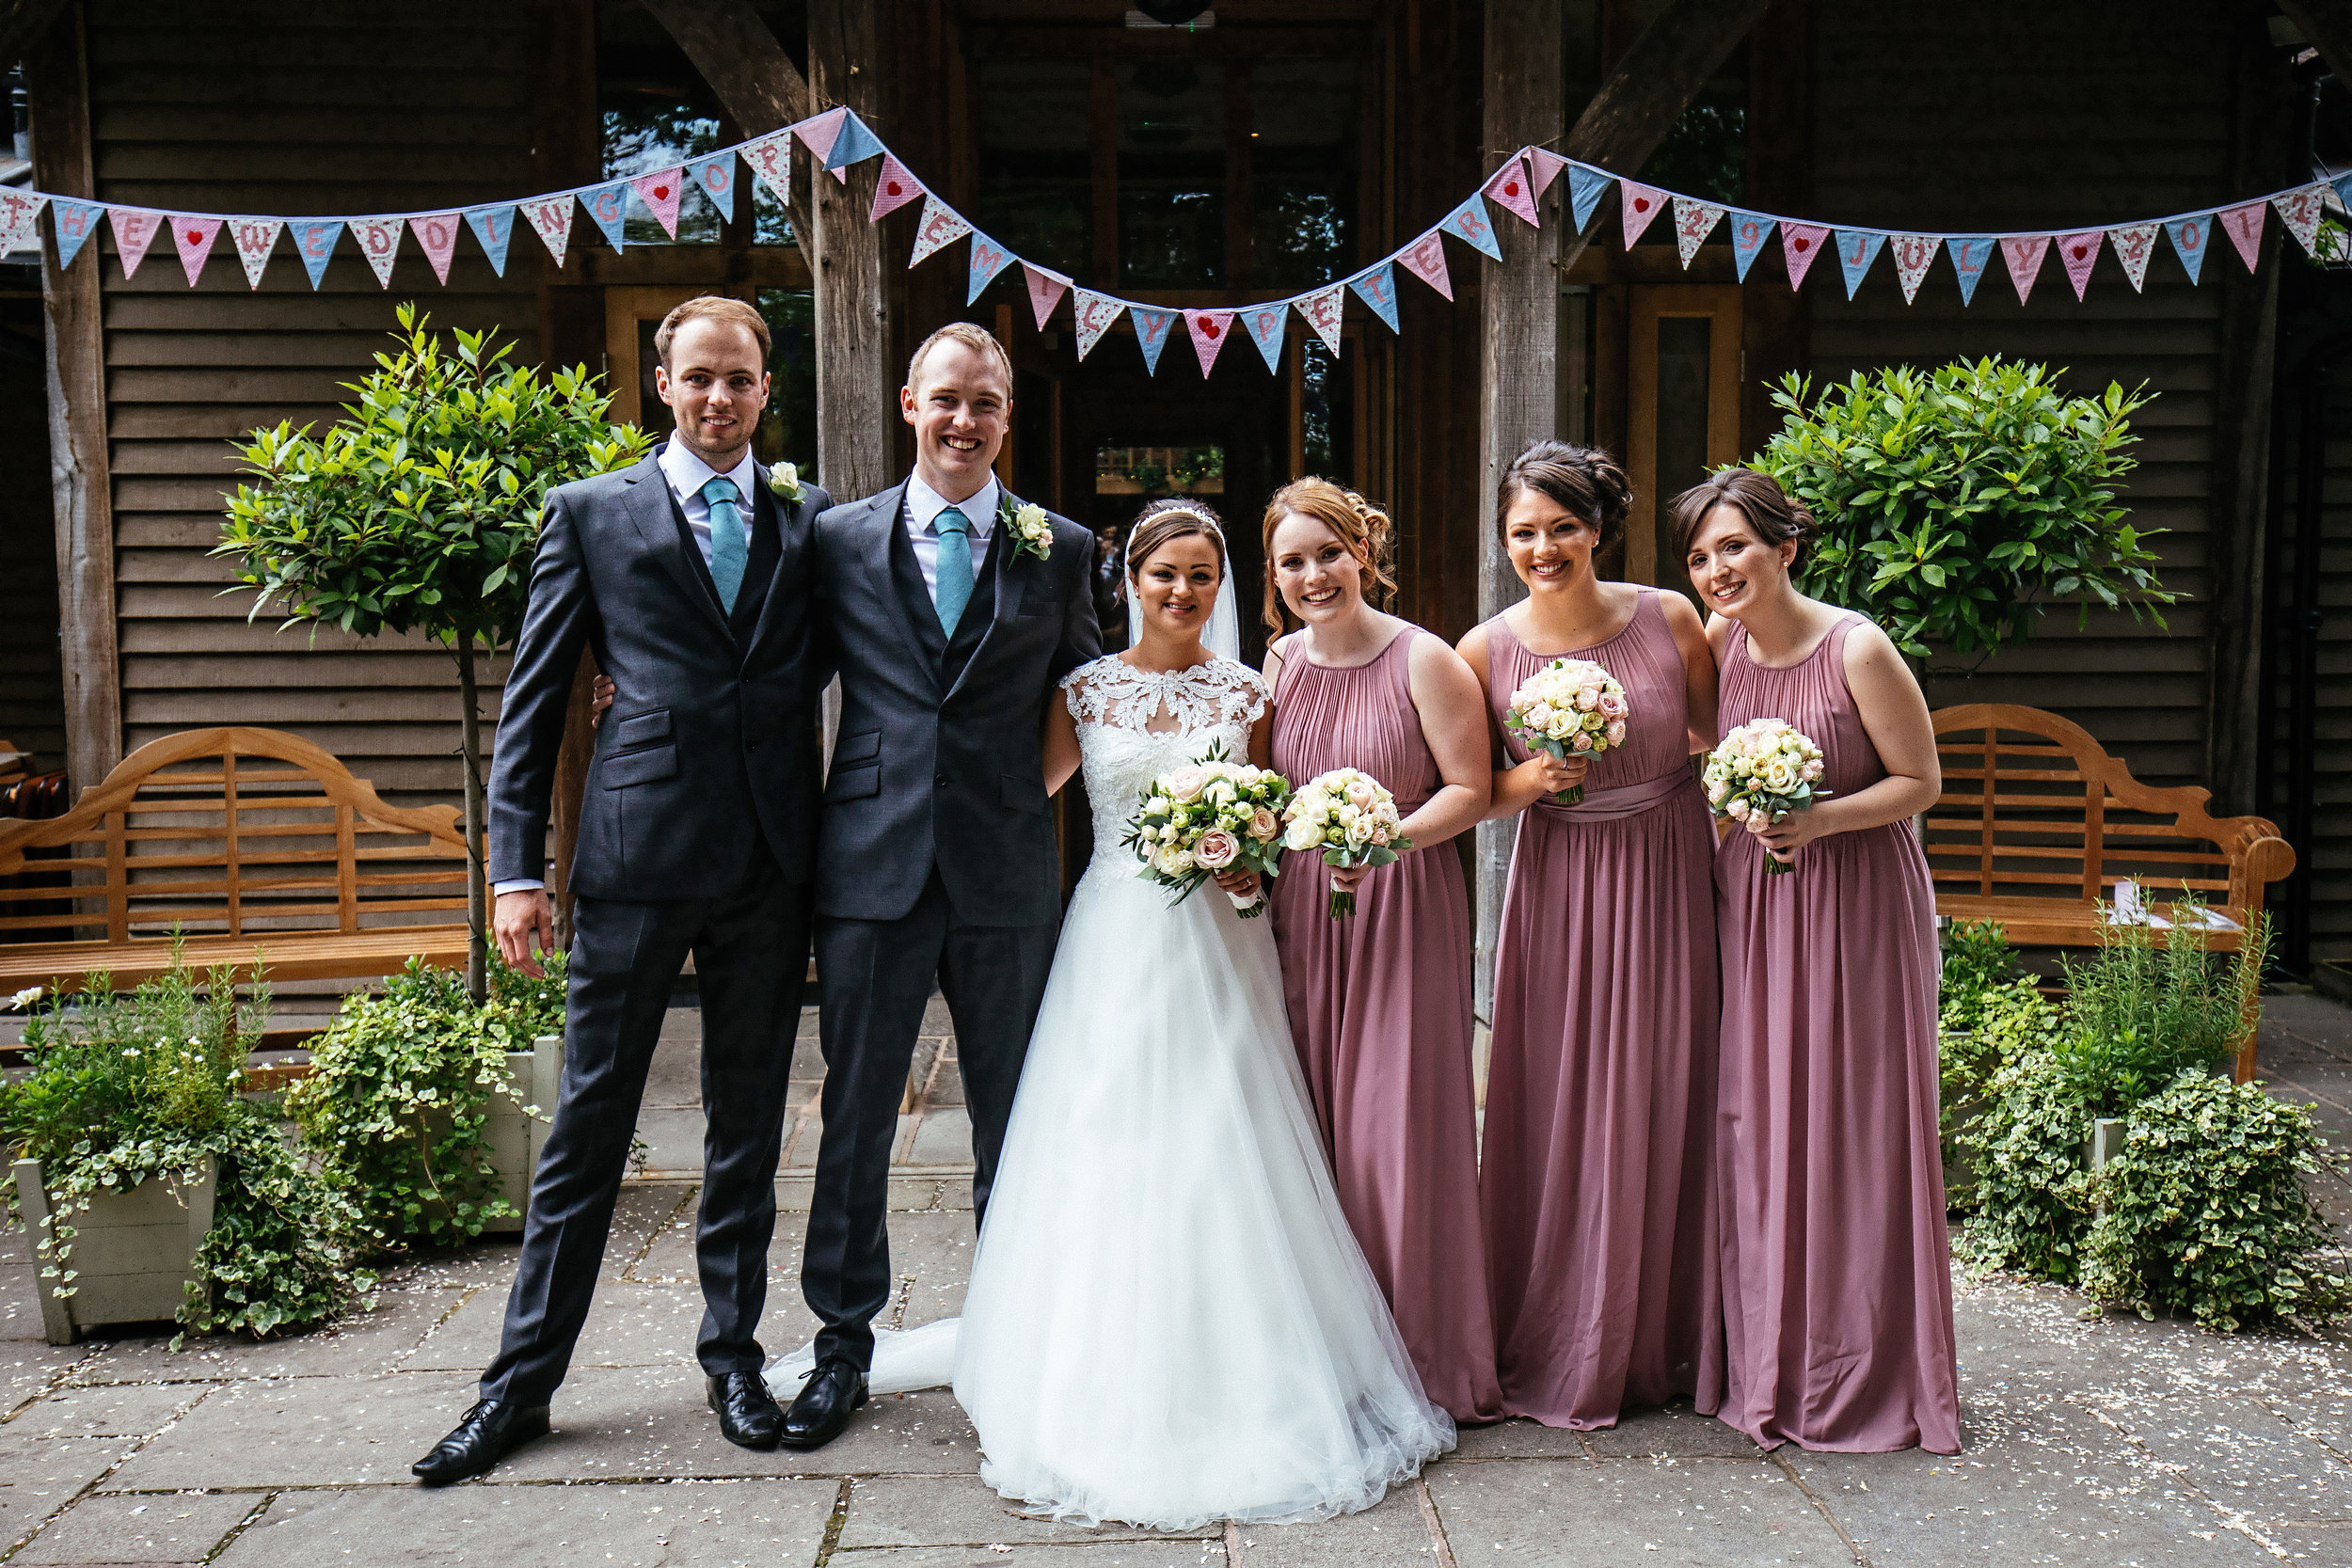 Emily-and-Peter-Wedding-Highlights-60.jpg